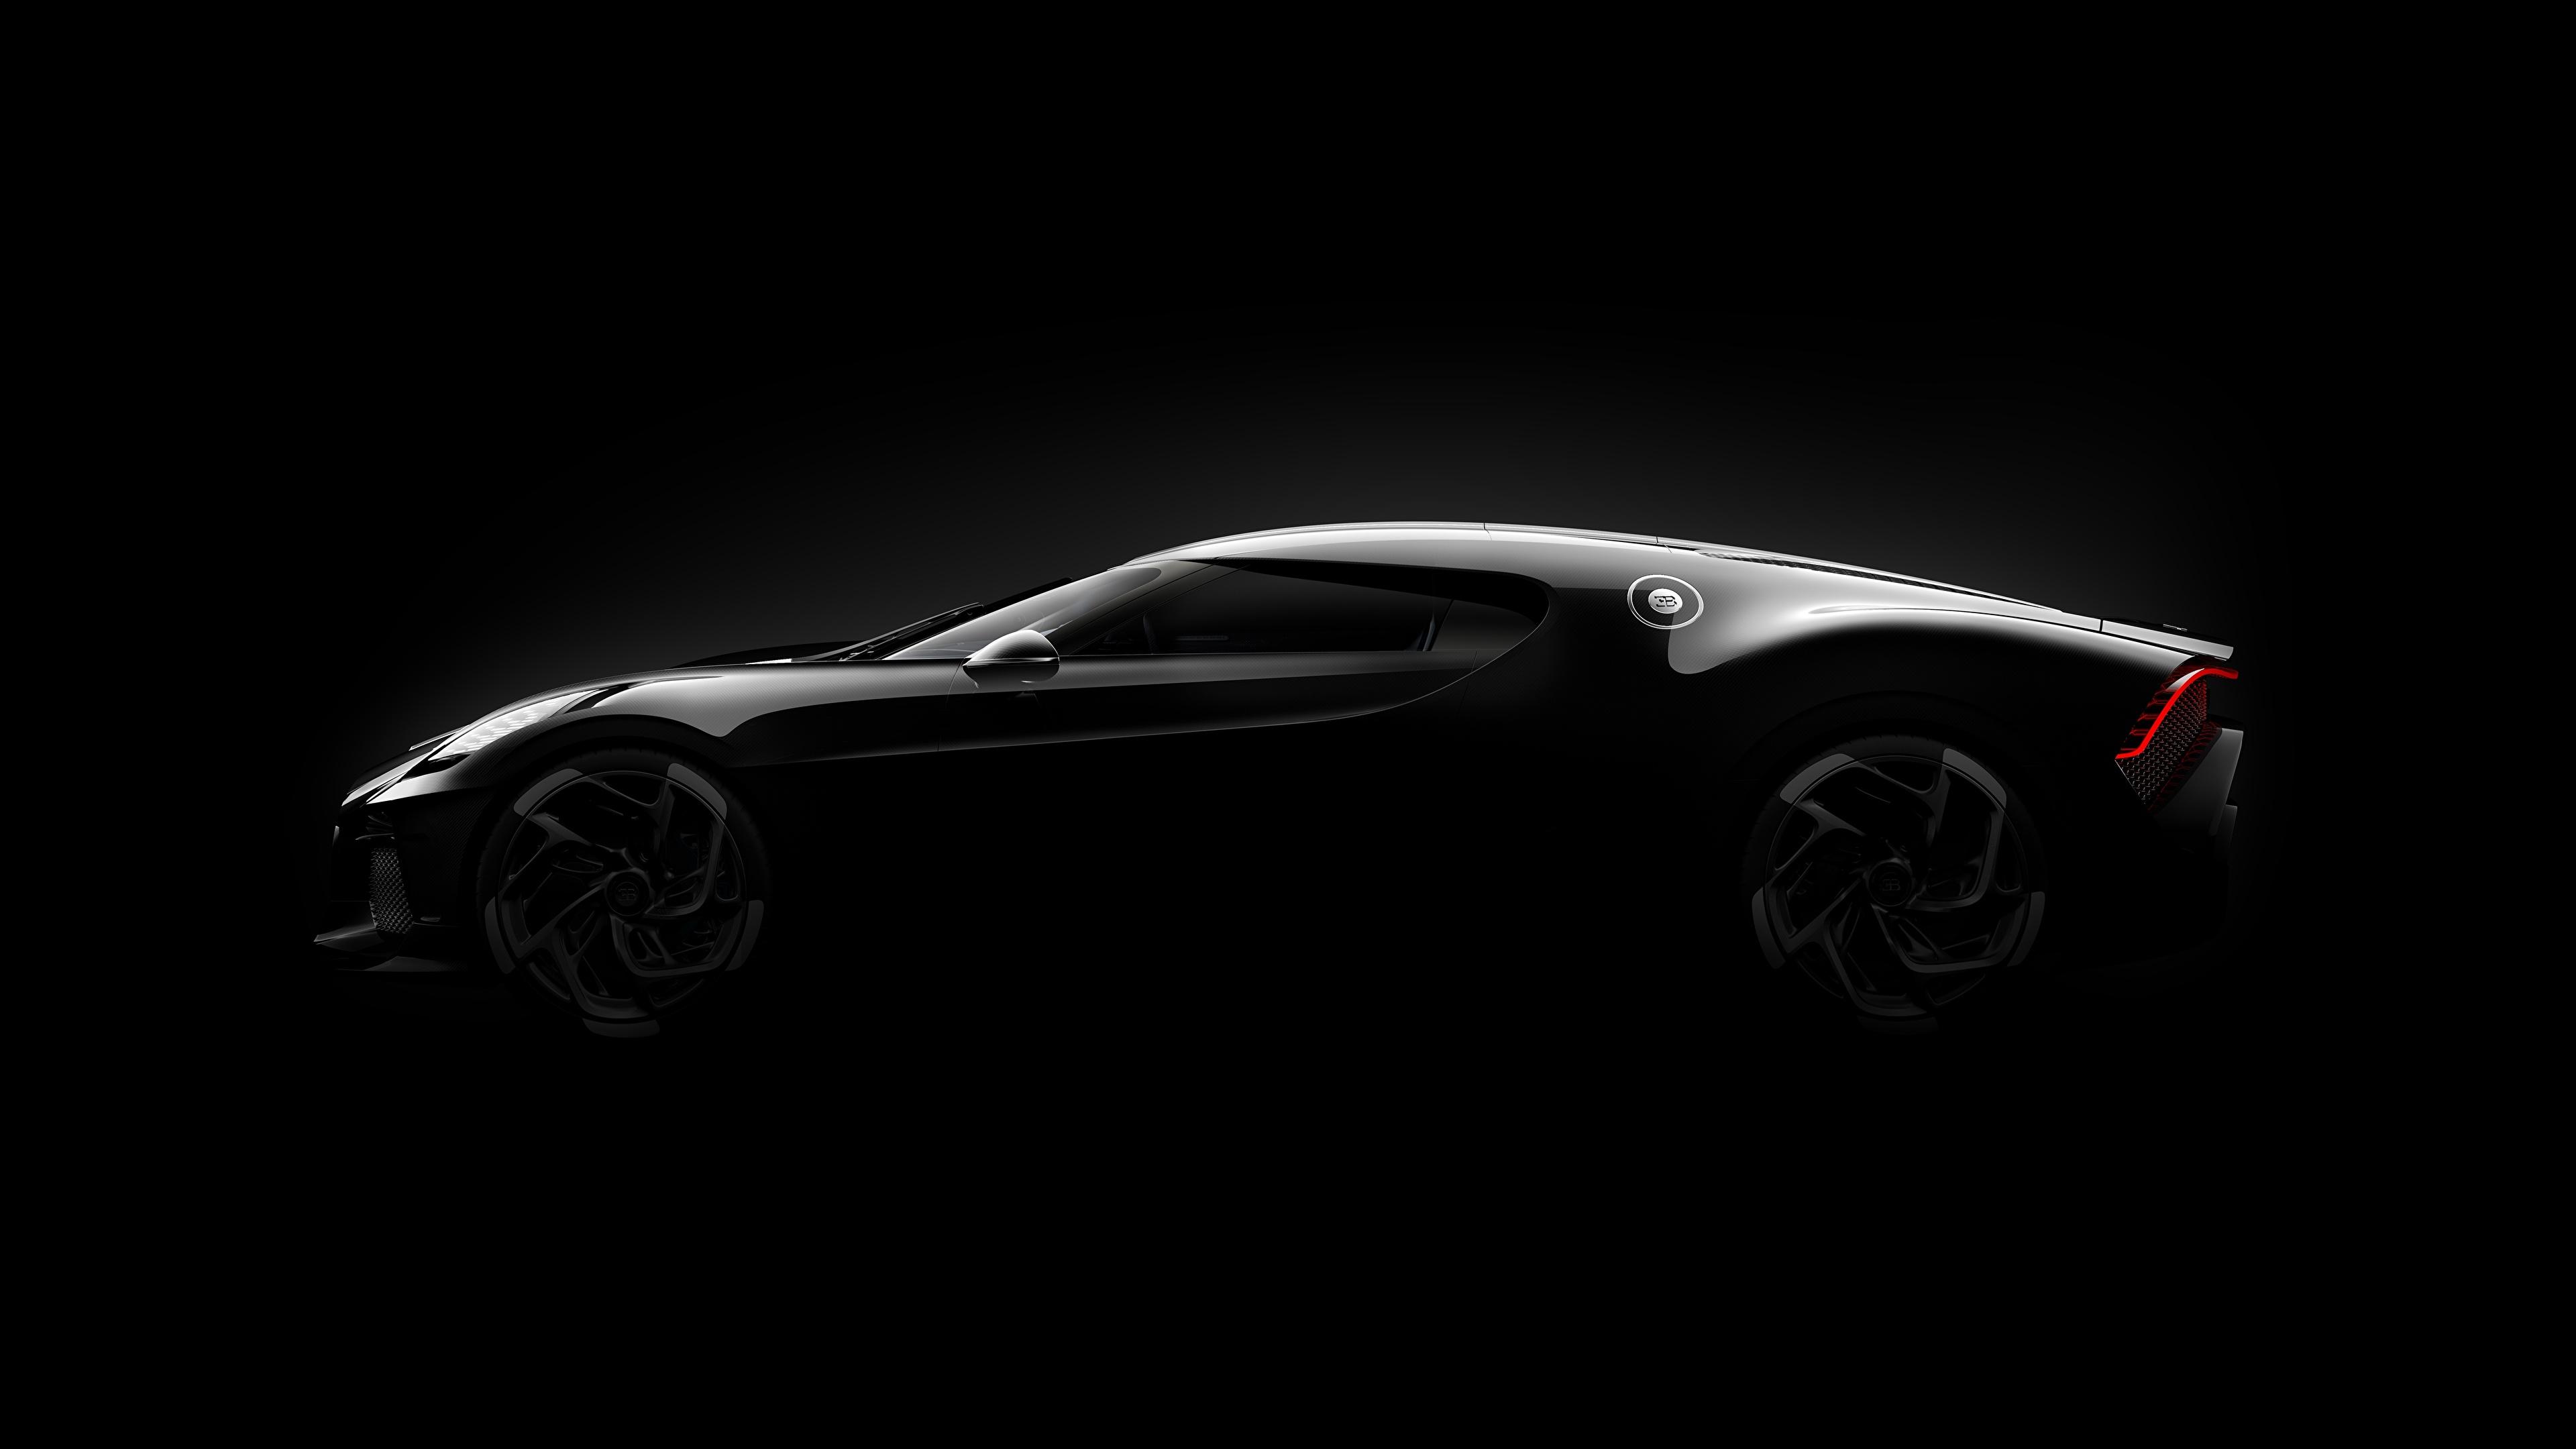 Download 2019 Bugatti La Voiture Noire Luxury Car: Image BUGATTI 2019 La Voiture Noire Black Cars Side Black